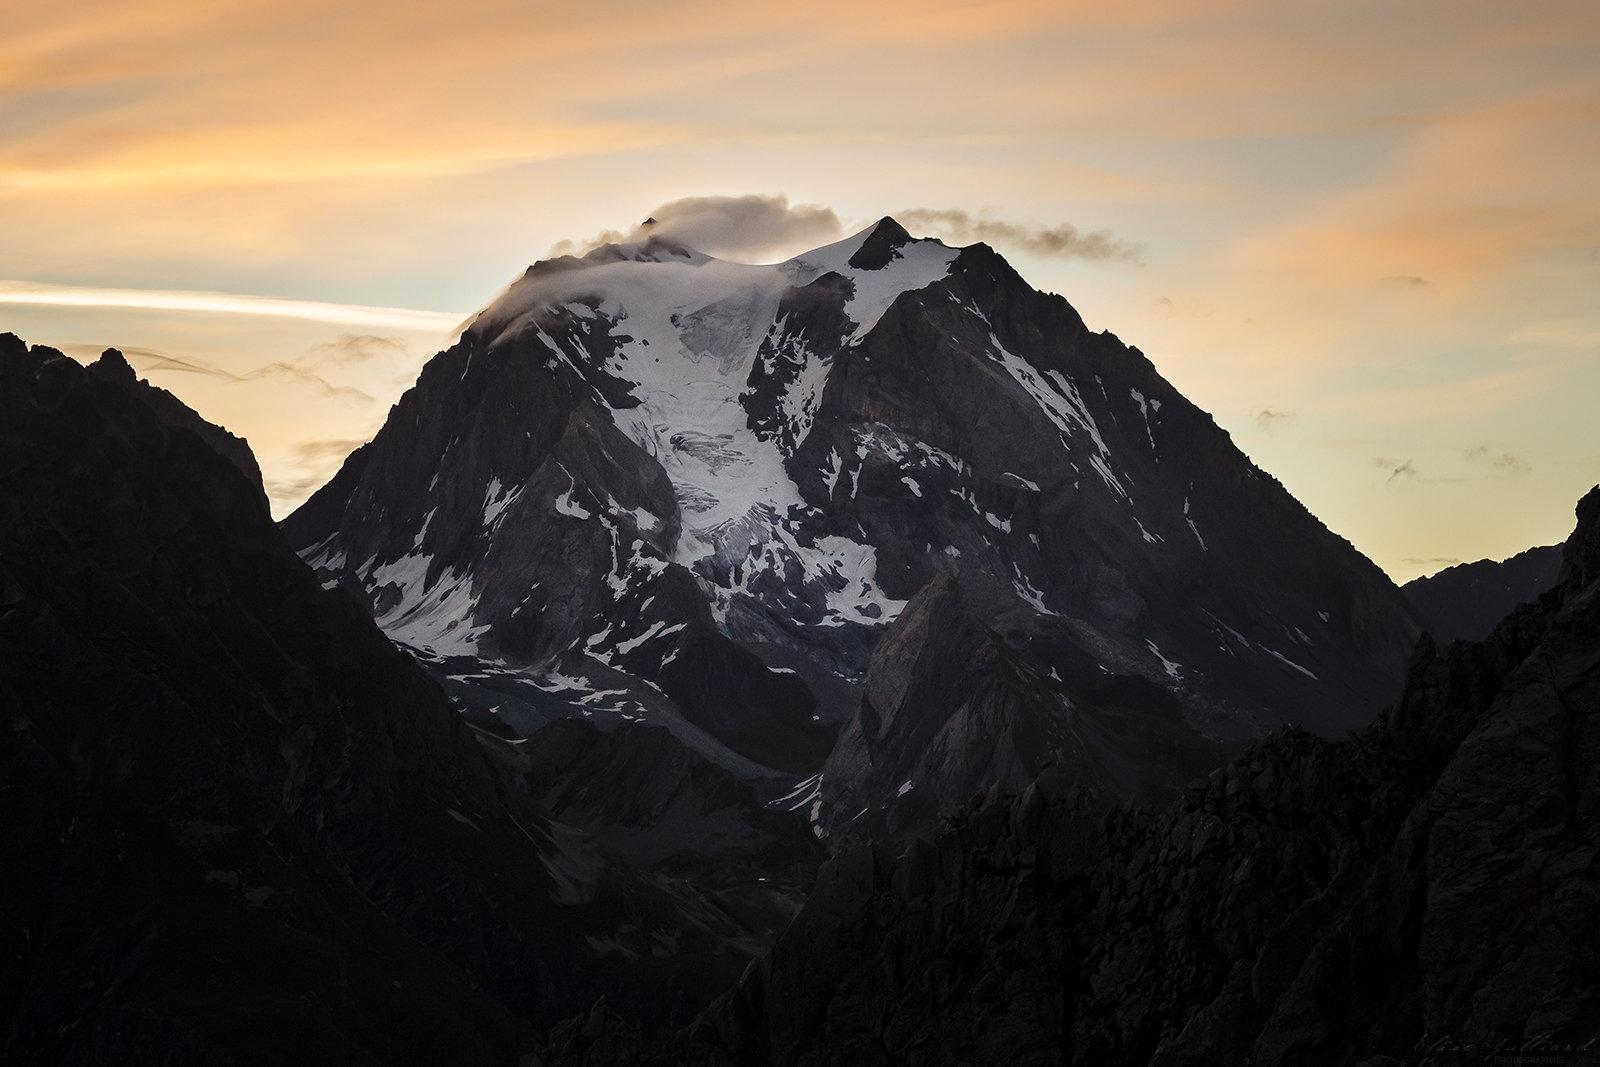 elise-julliard-photographe-rhone-alpes-paysage-grande-casse-tarentaise-pralognan-la-vanoise